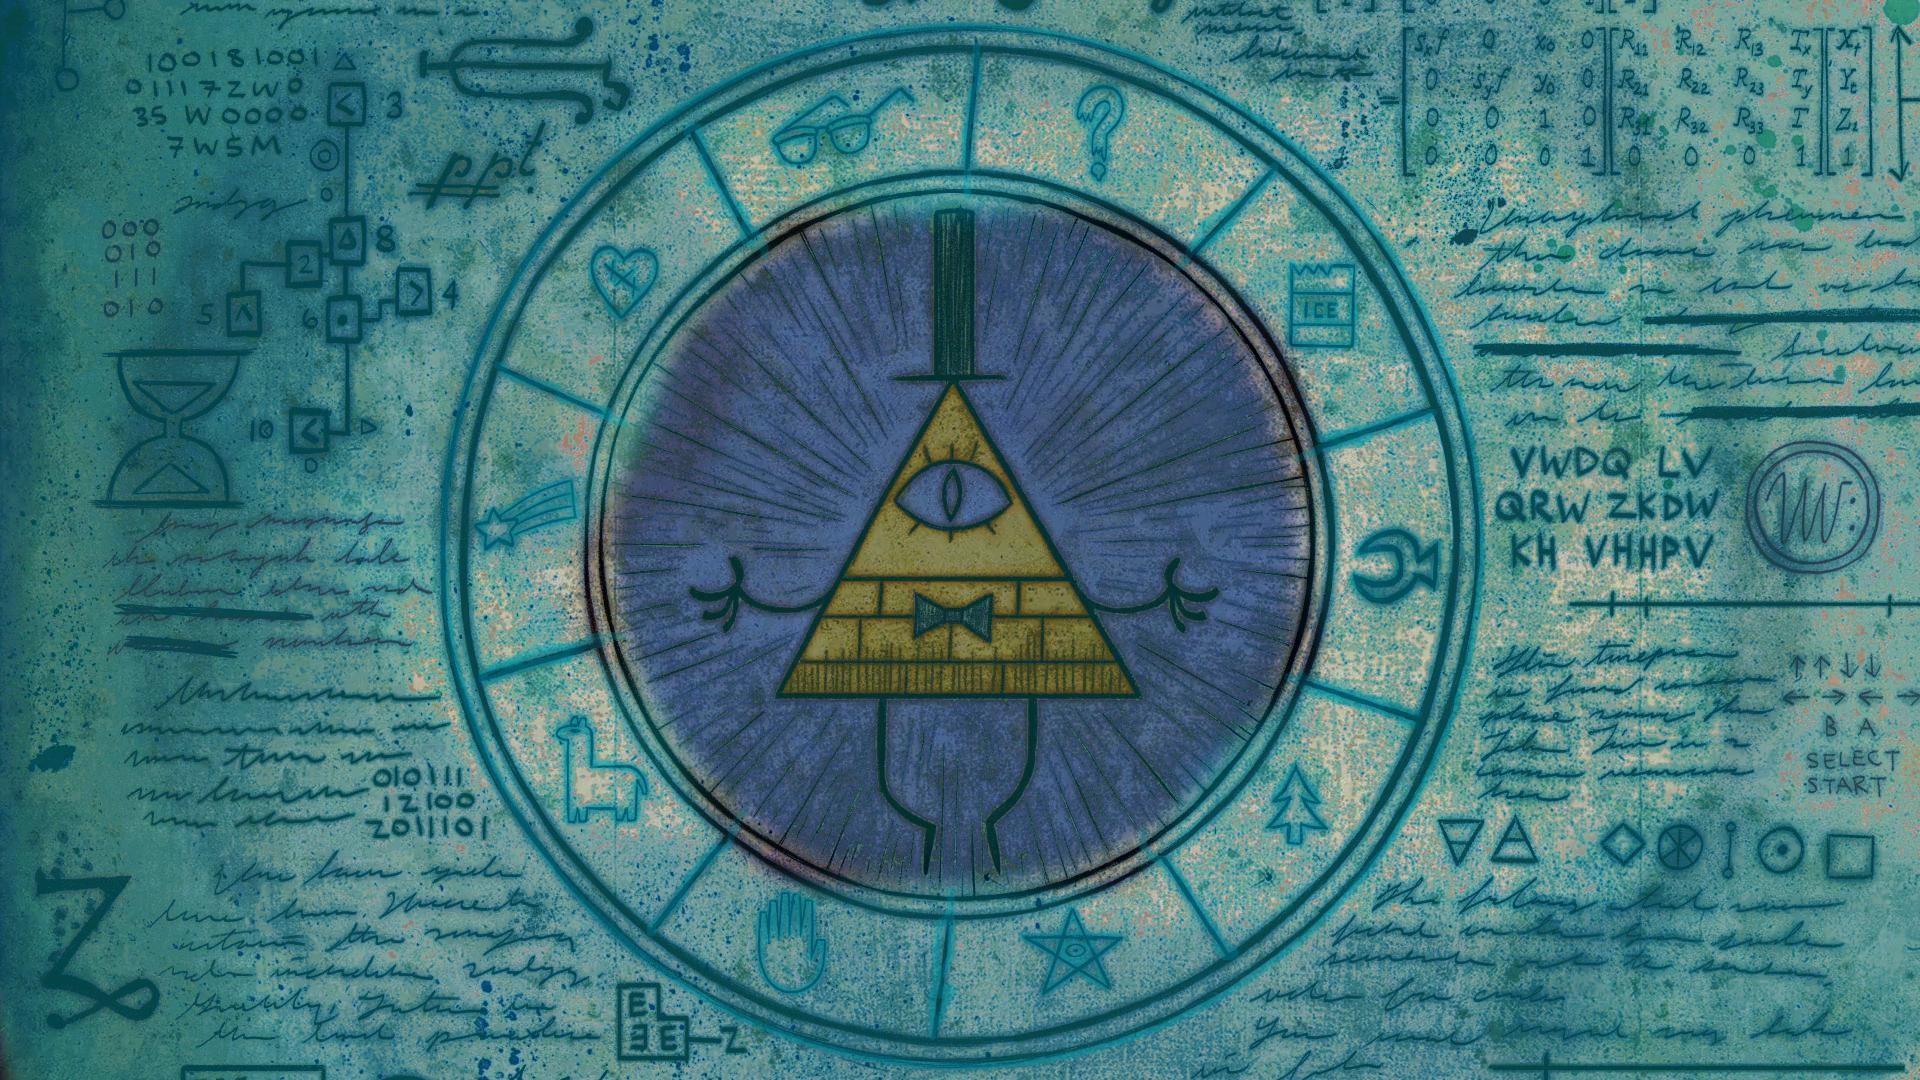 3d Lotus Live Wallpaper Gravity Falls Hd Wallpaper 65 Images